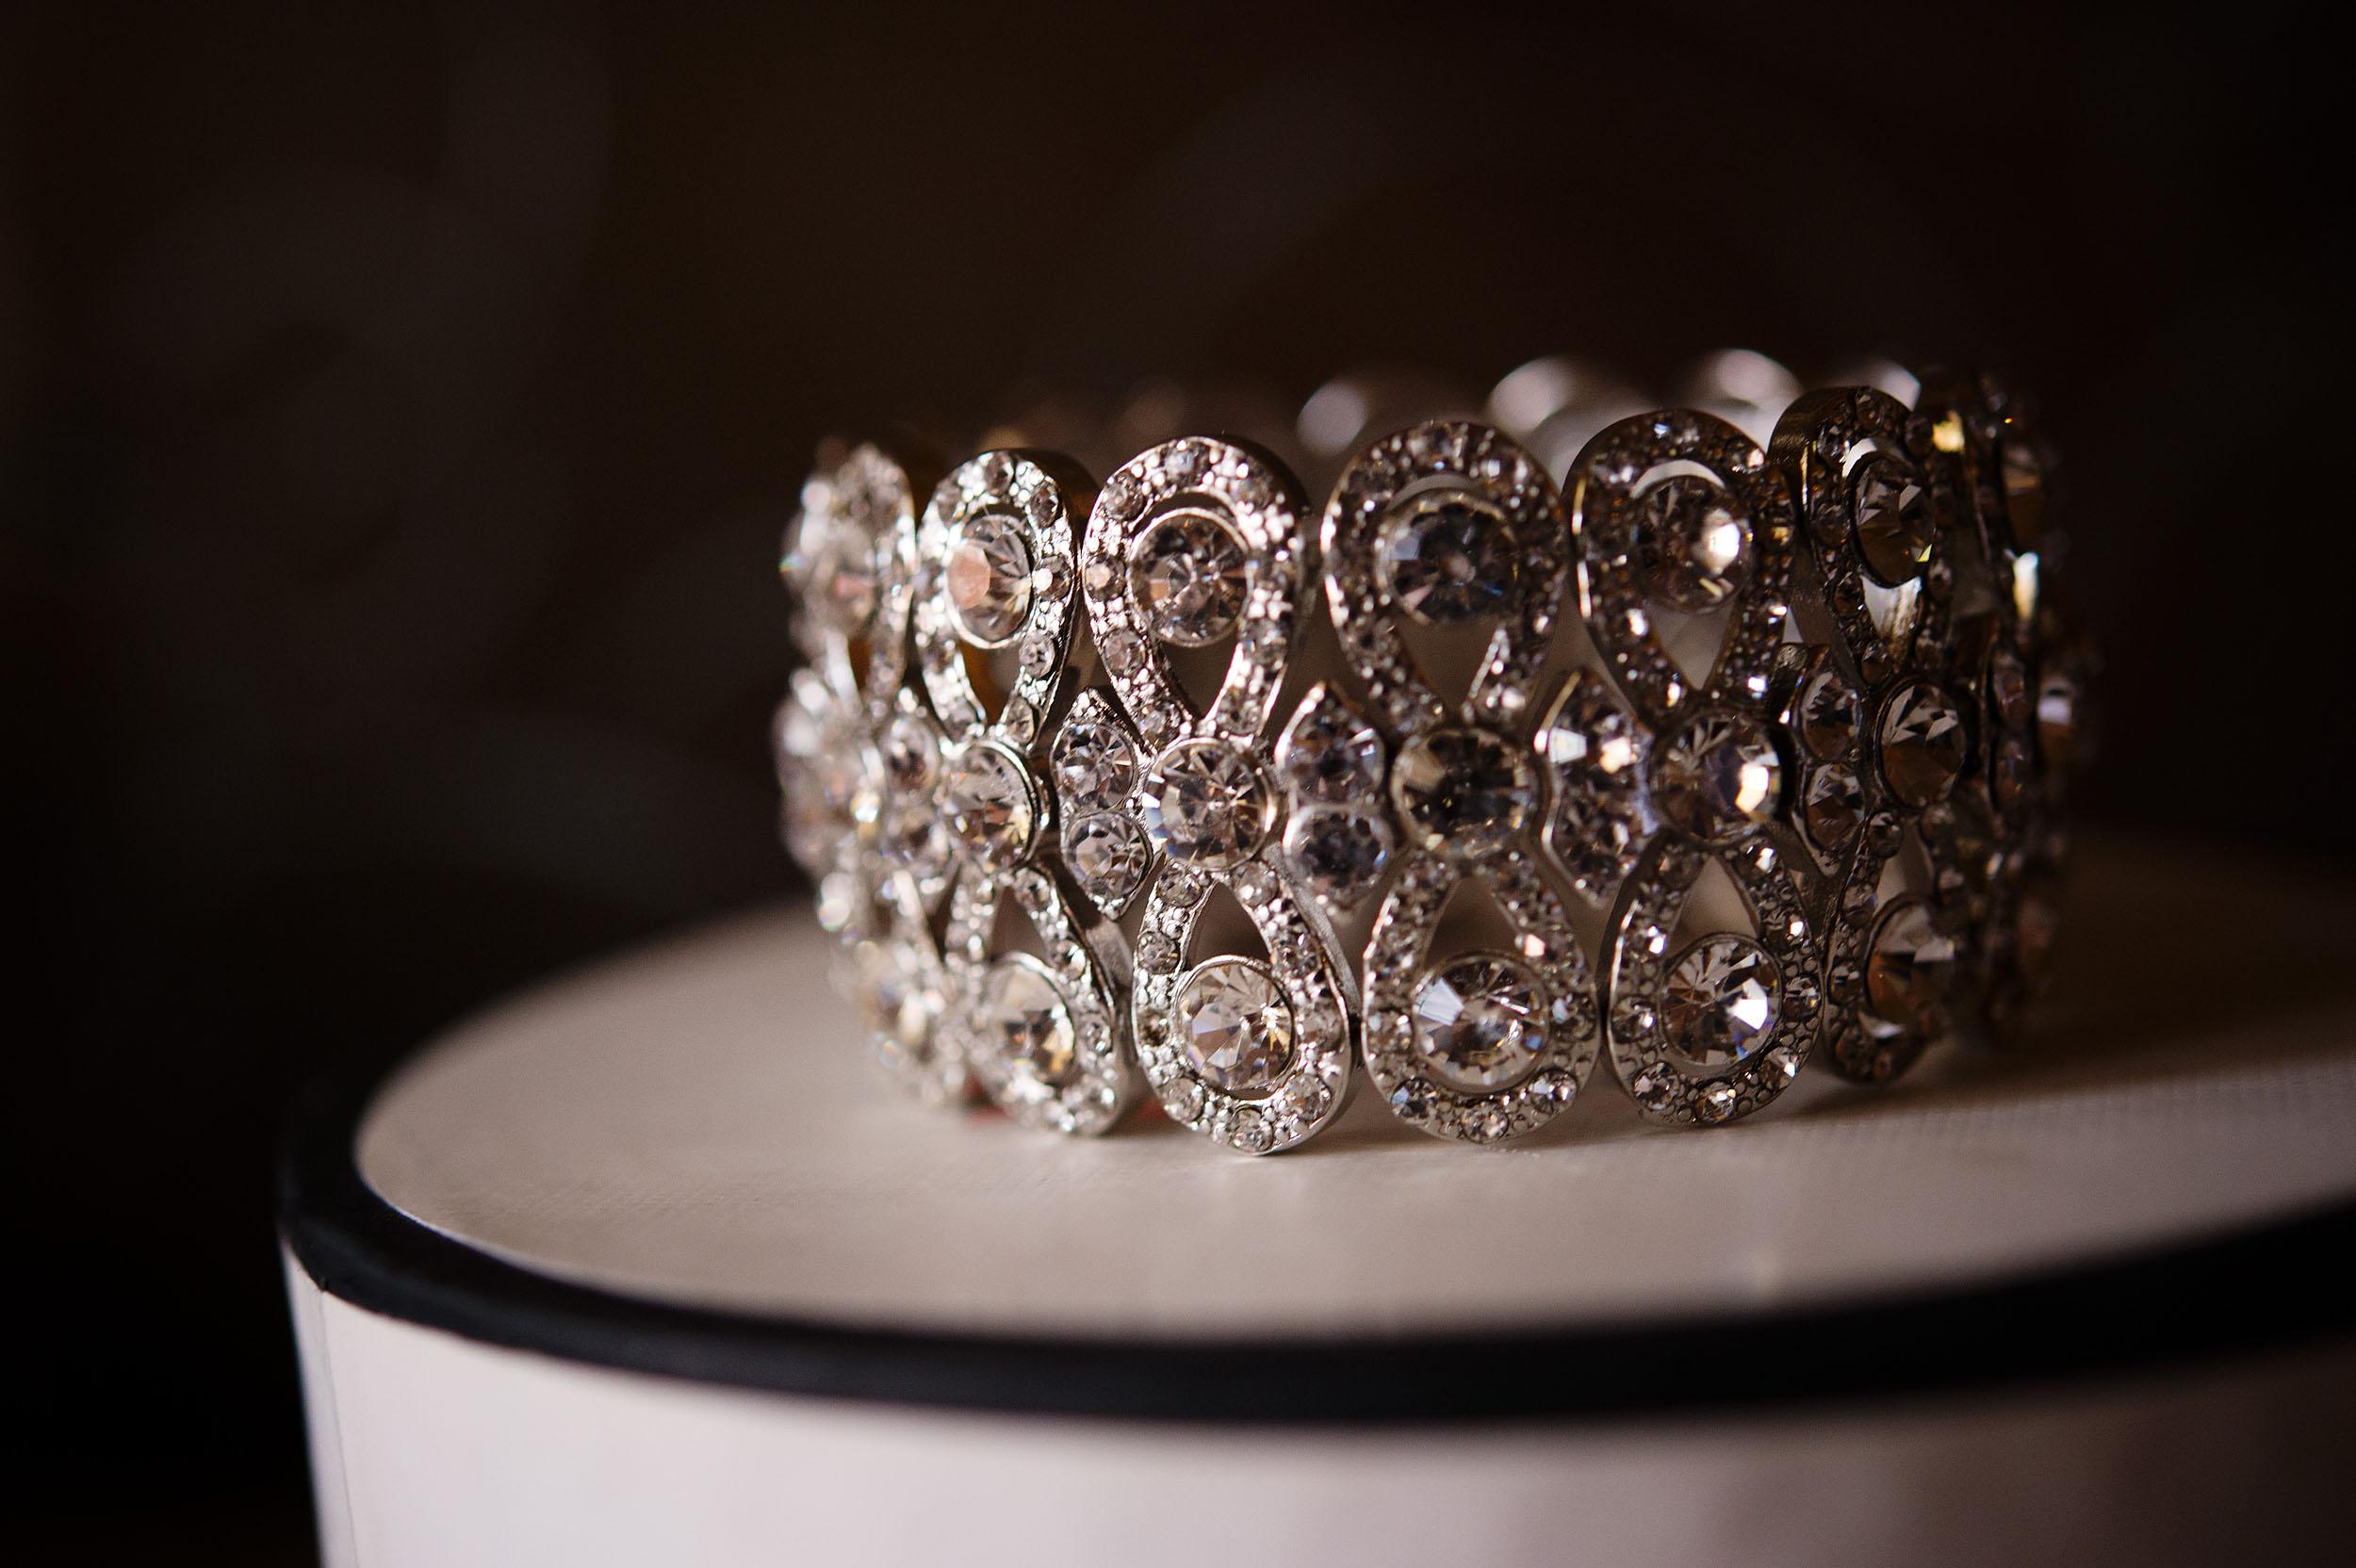 Bride's bracelet detail at the Westlake Village Inn.